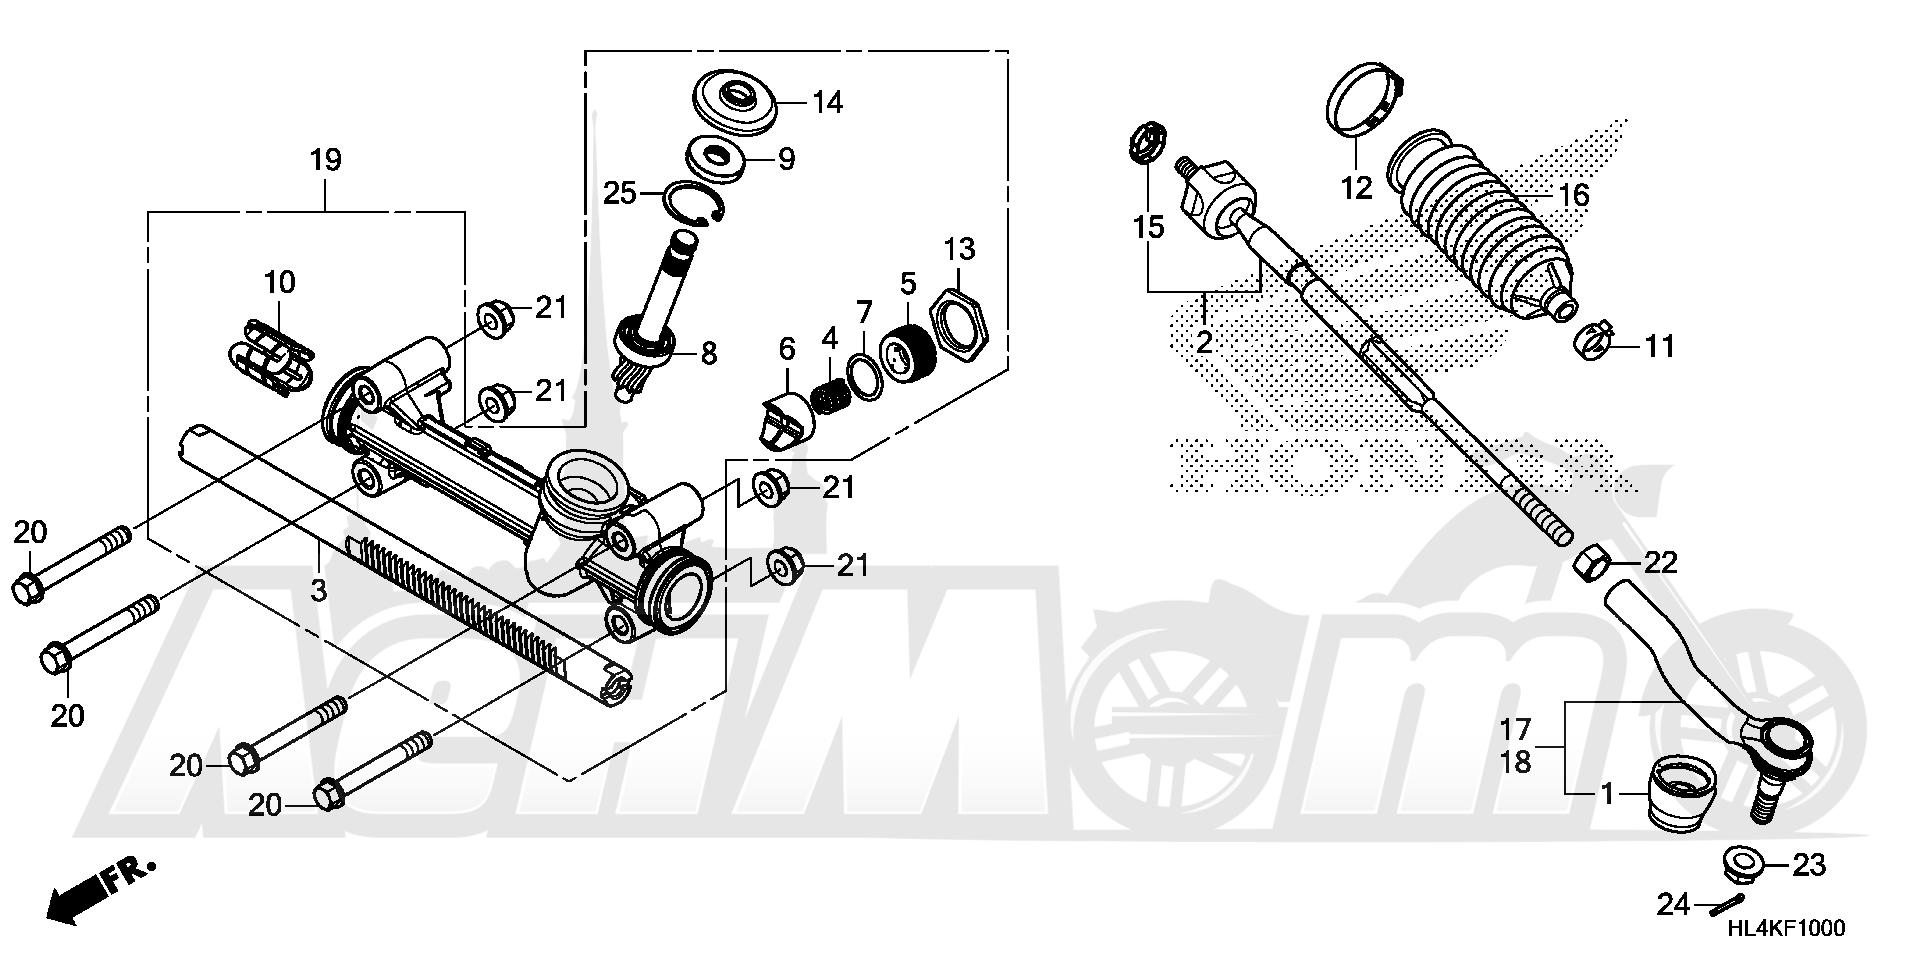 Запчасти для Квадроцикла Honda 2019 SXS1000M3P Раздел: STEERING GEAR BOX AND TIE ROD | рулевое управление коробка передач и рулевая тяга